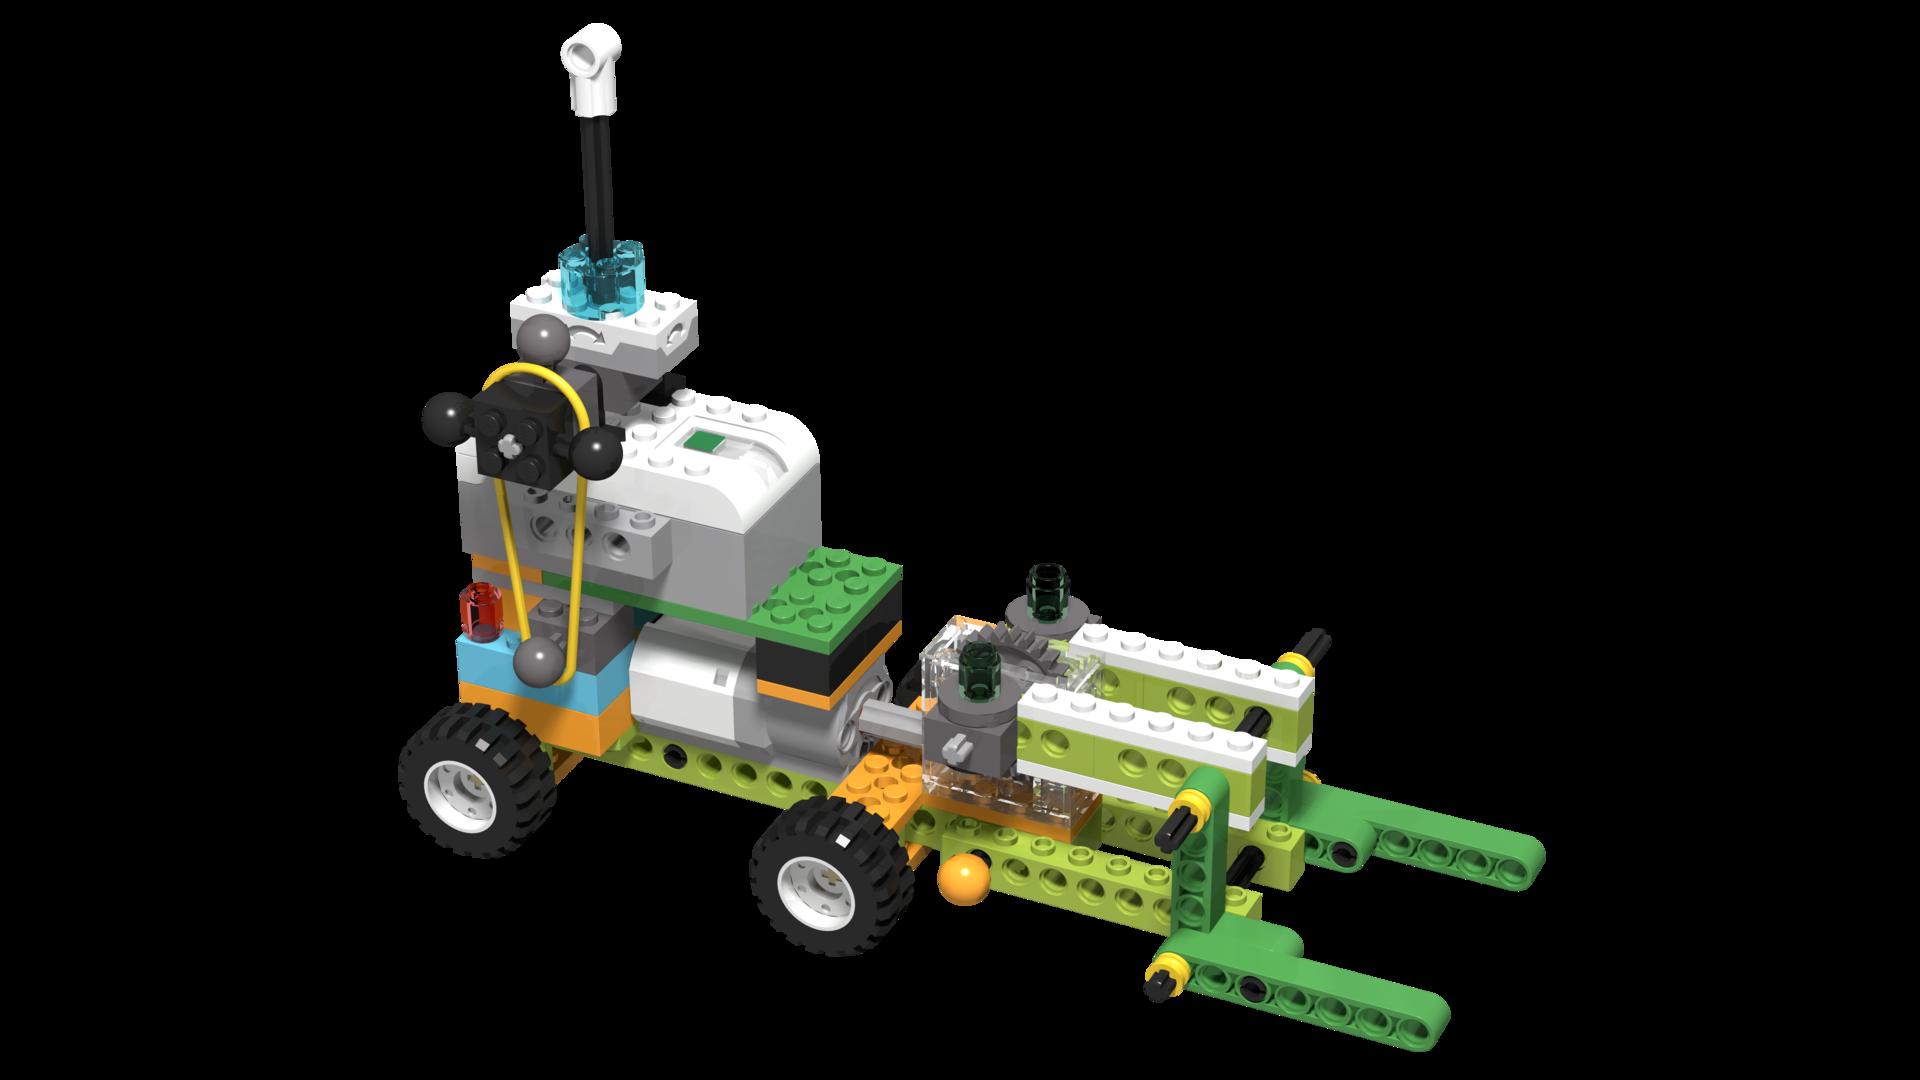 WeDo 2.0 robotic forklift